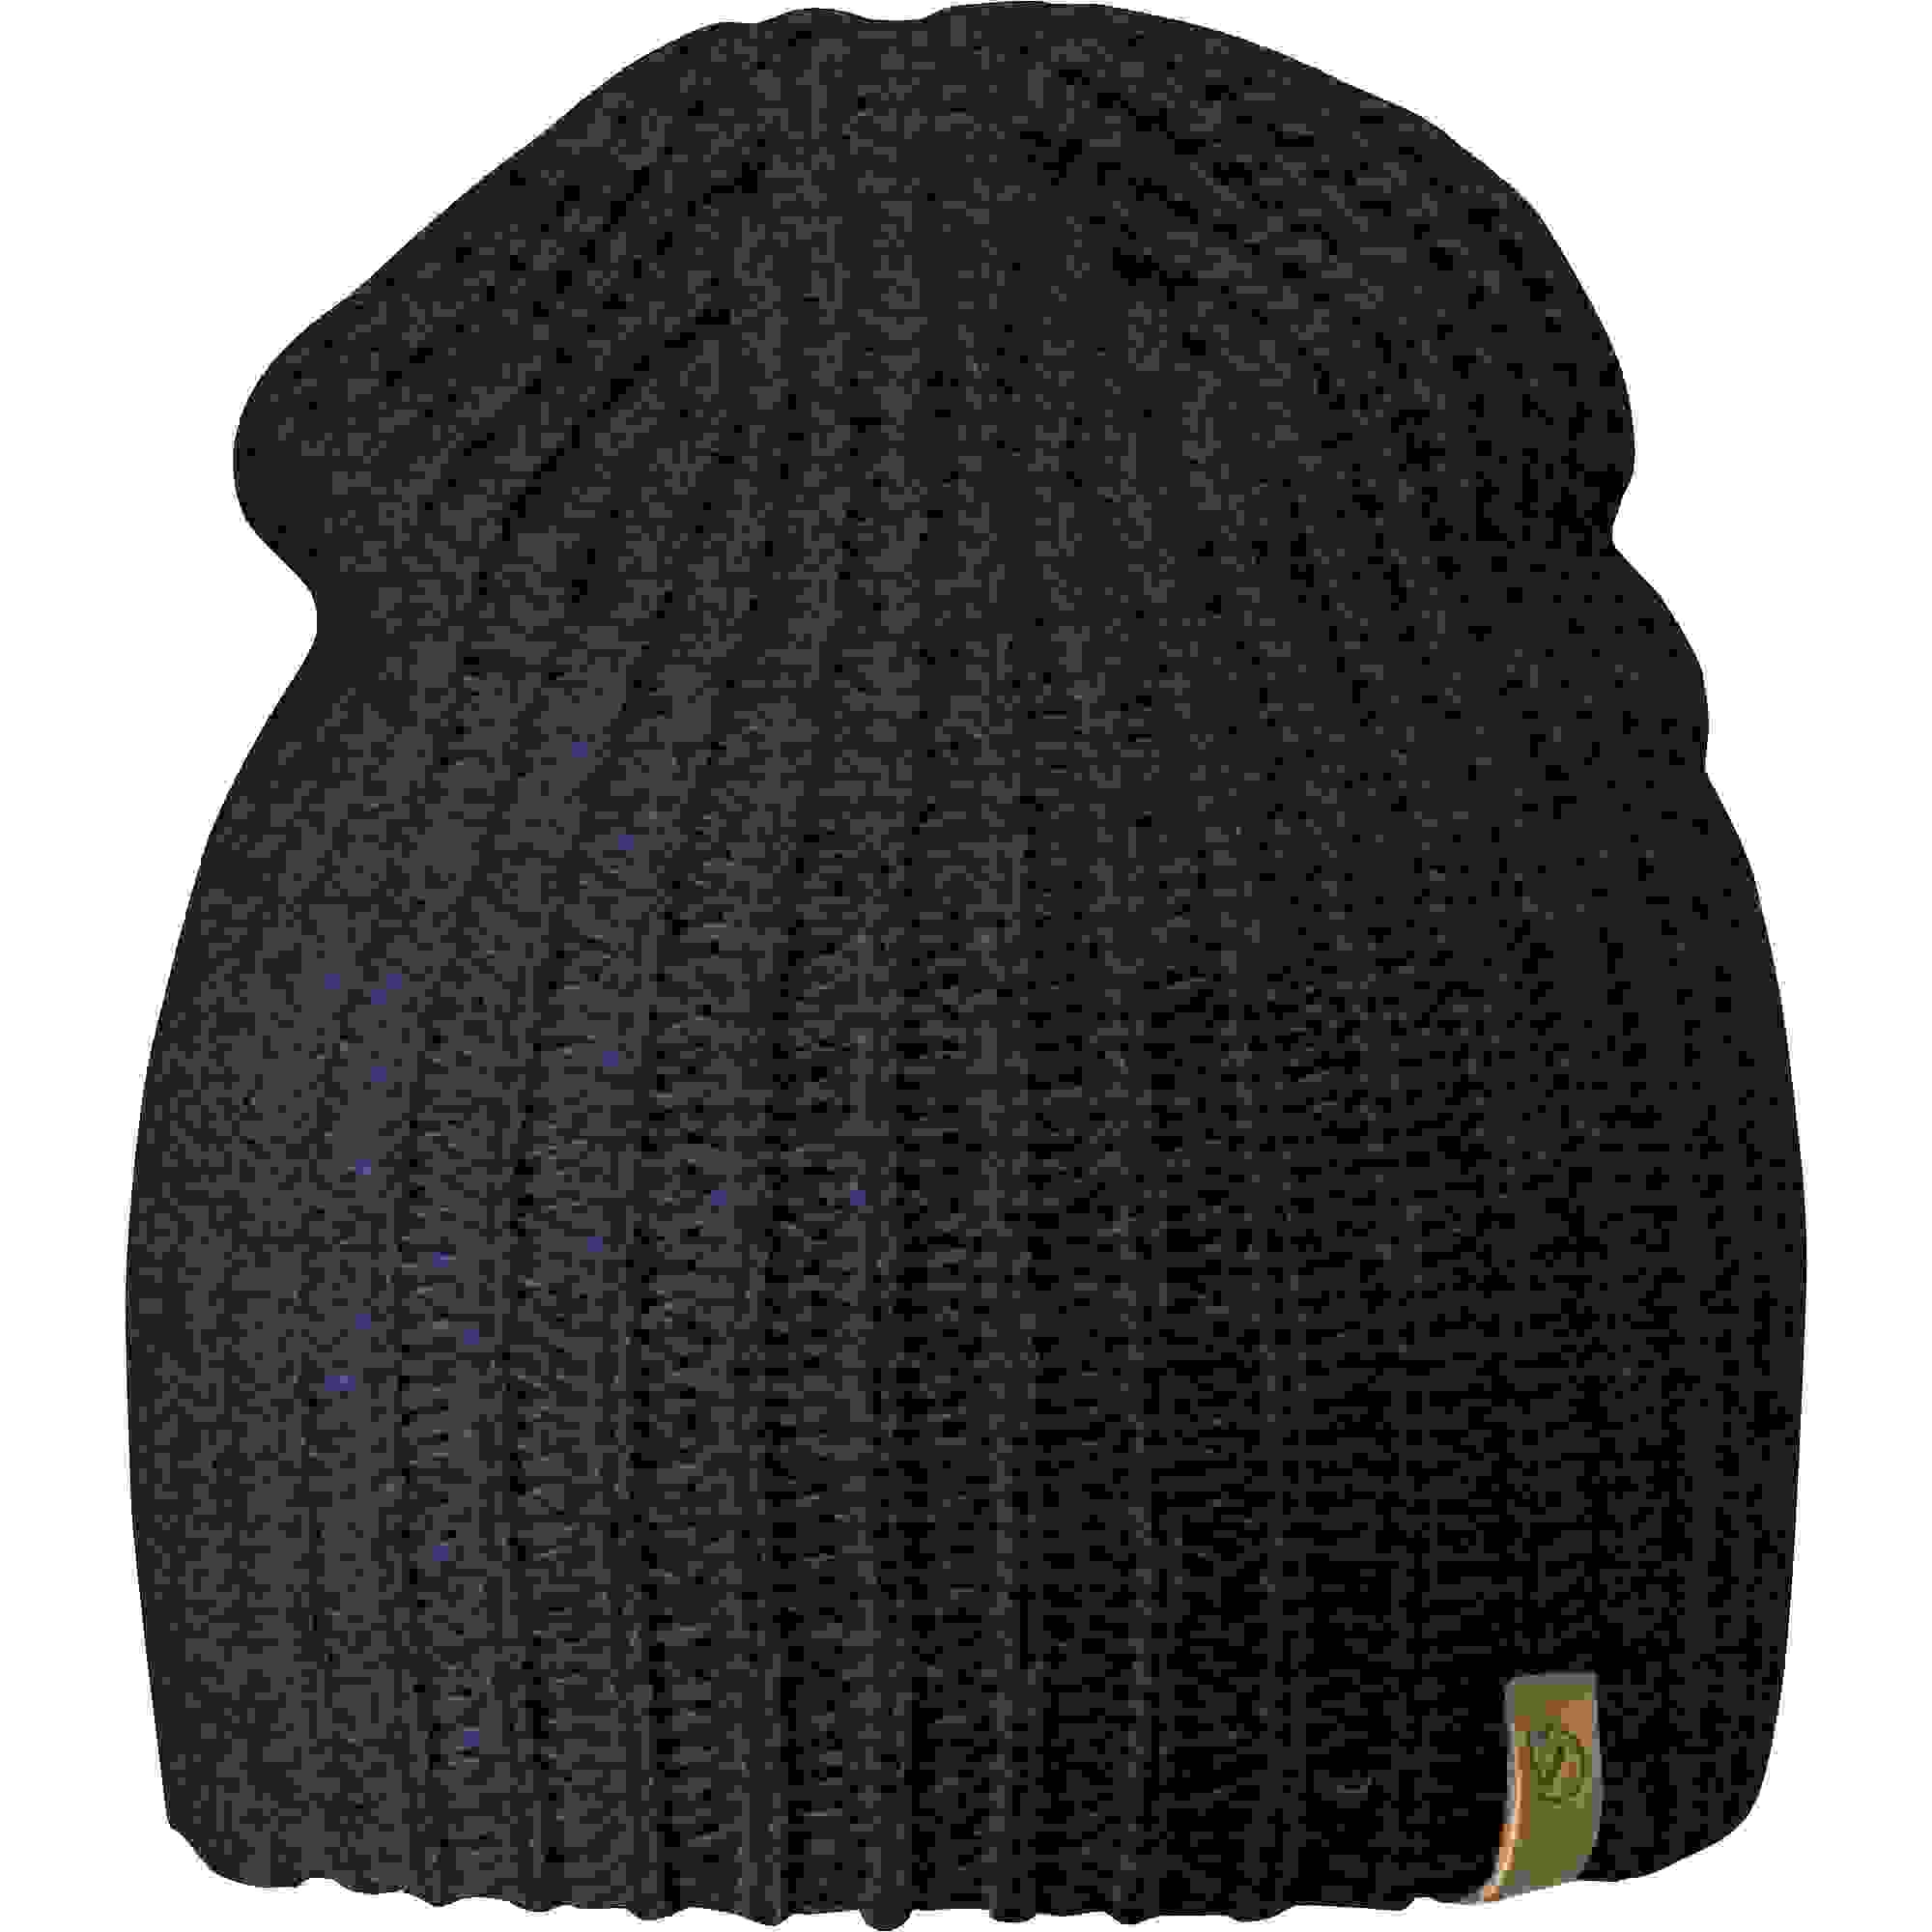 OVLSDD Calm The Fuck Down Unisex Hedging Cap Beanie Baggy Hat Slouchy Skull Beanie Headwear Skull Cap Knitted Hat Black